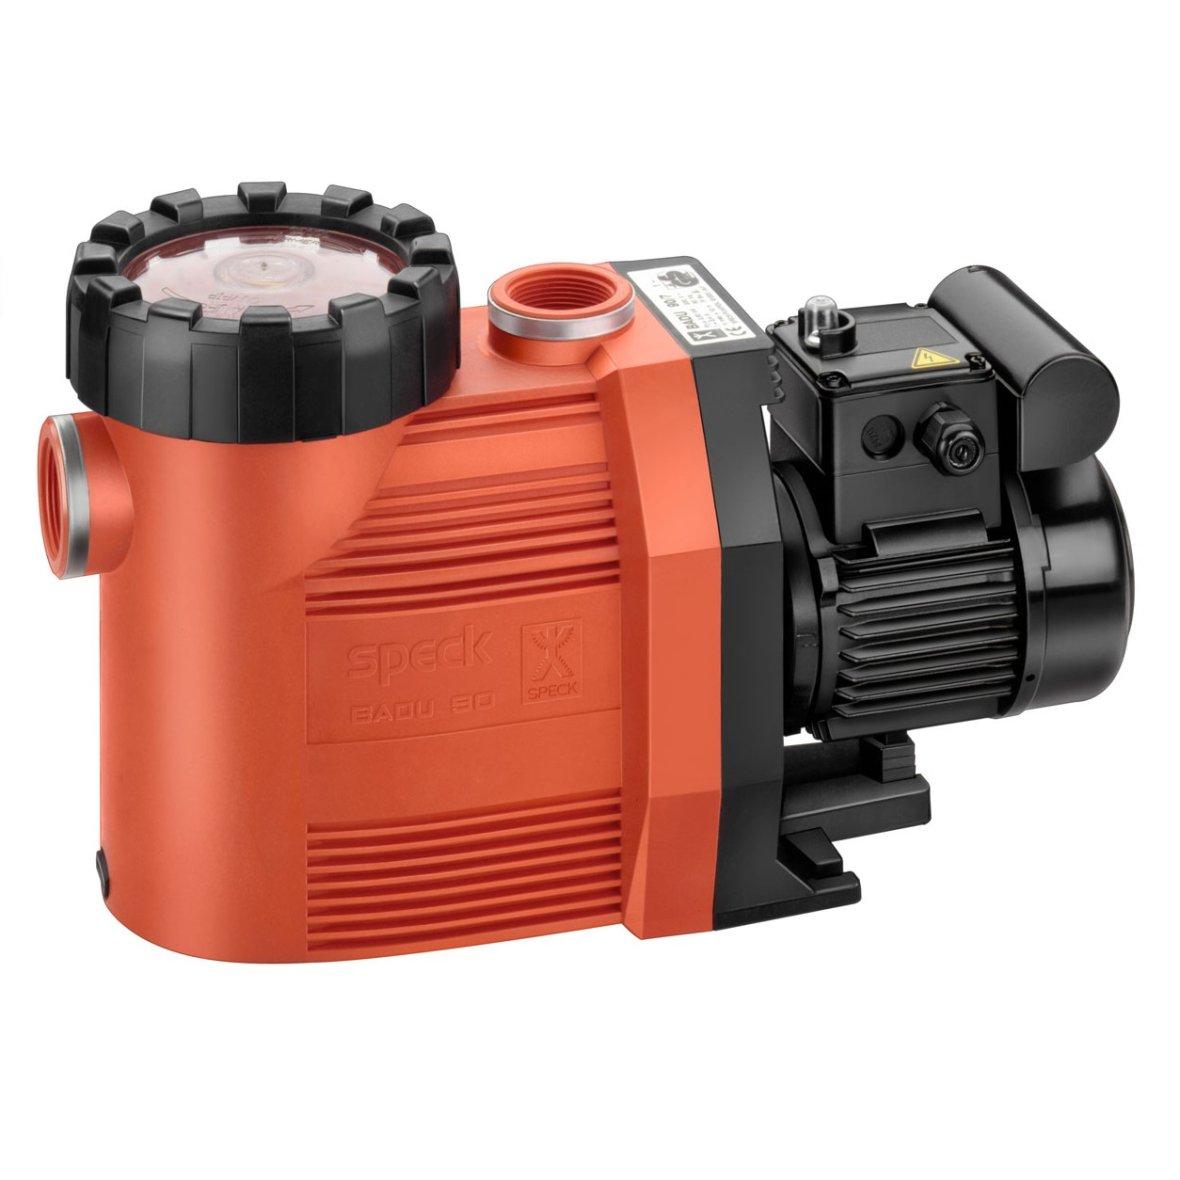 Badu 90/13 three-phase pool pump